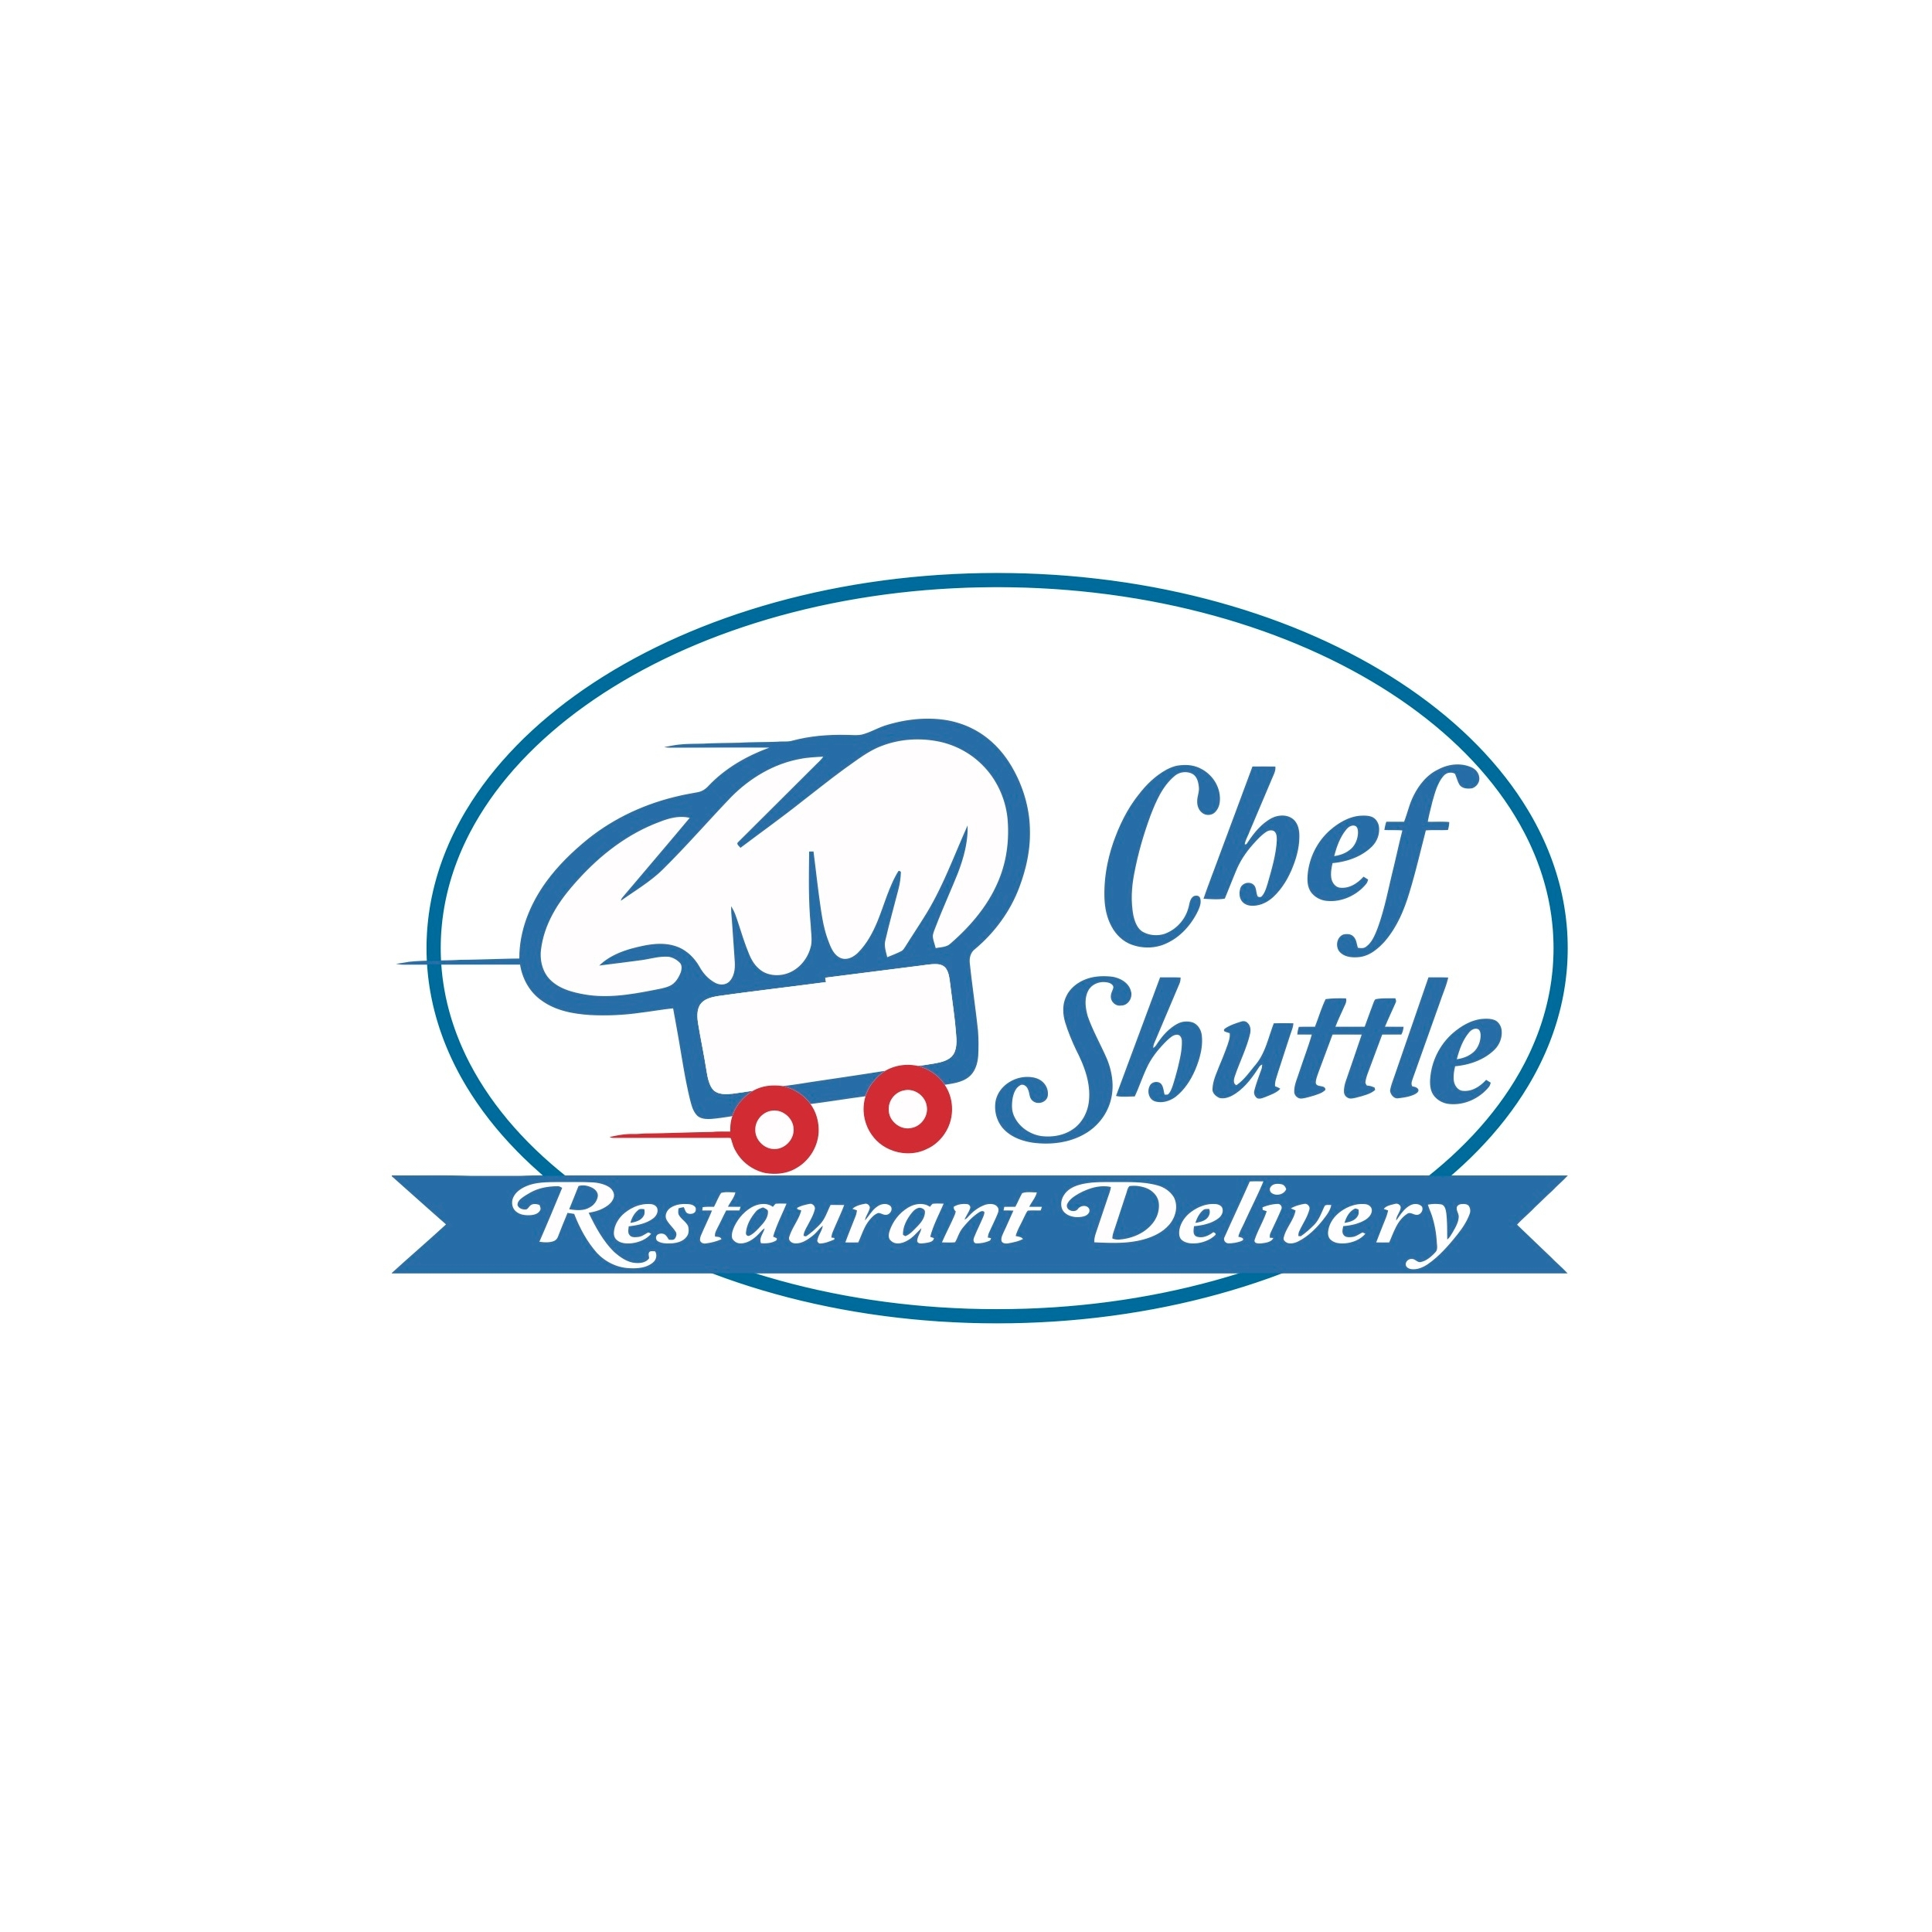 Chef Shuttle Memphis